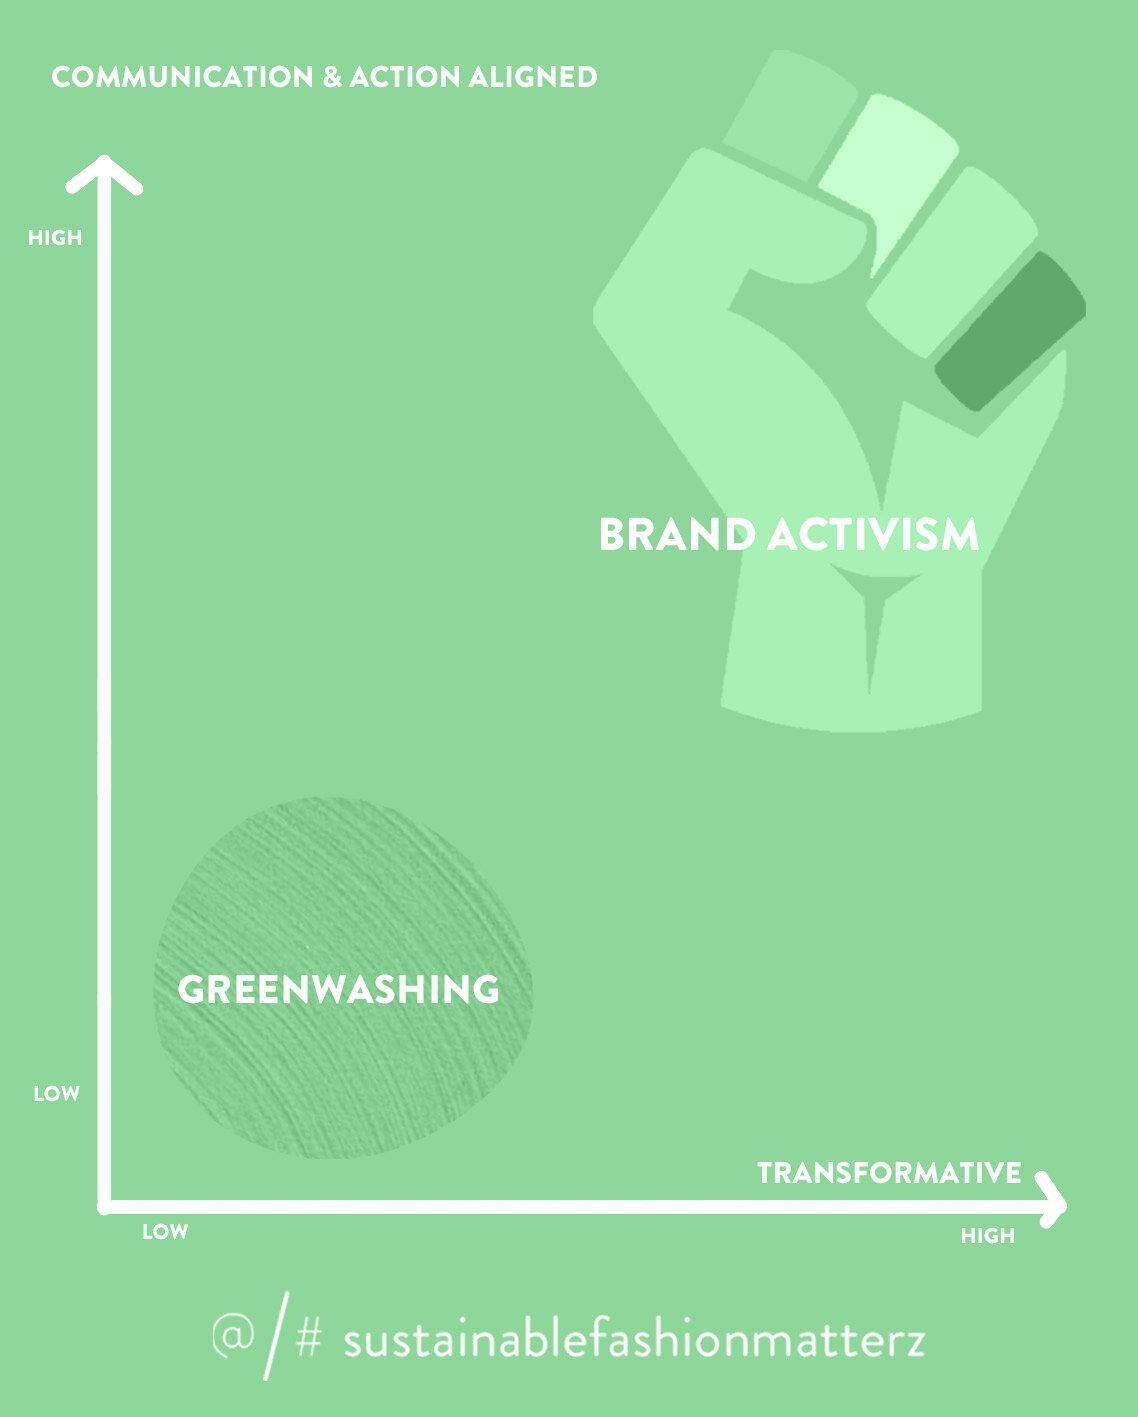 brand-activismgreenwashing jpg